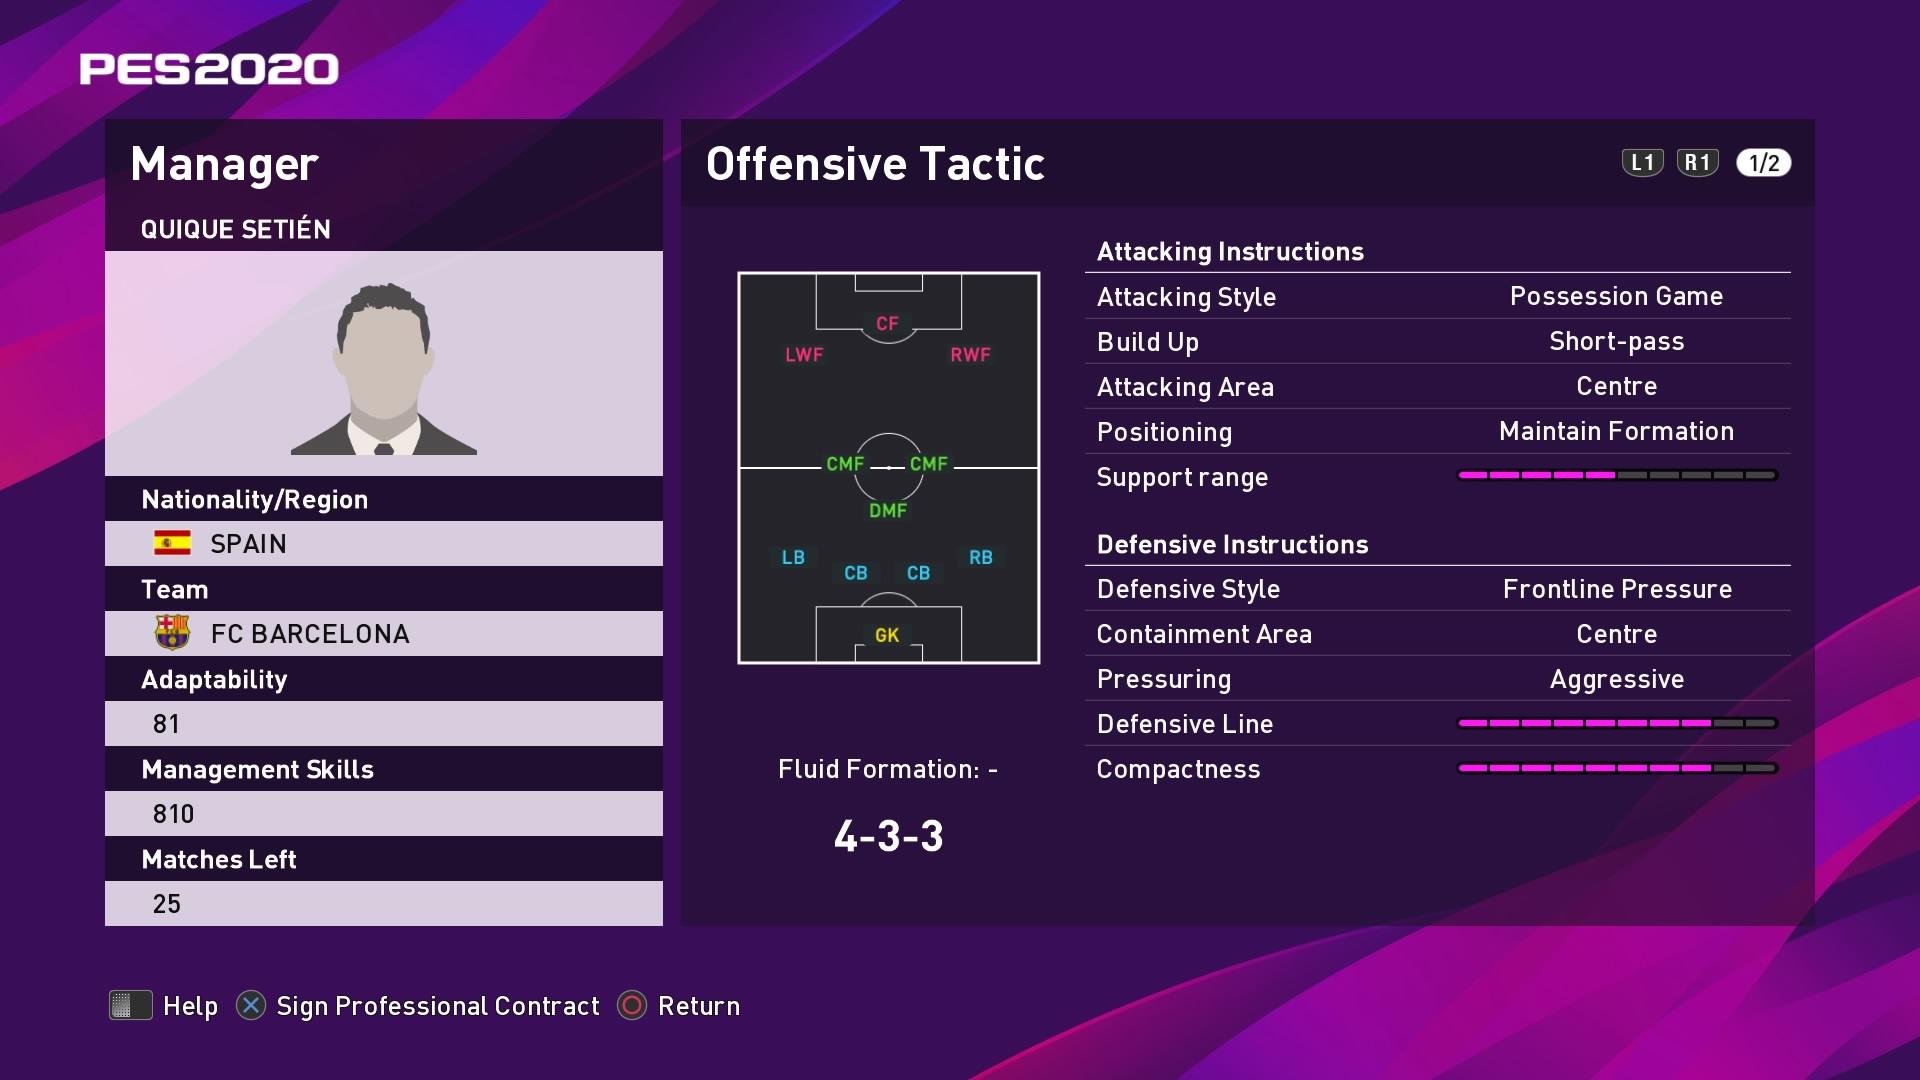 Quique Setién (2) Offensive Tactic in PES 2020 myClub